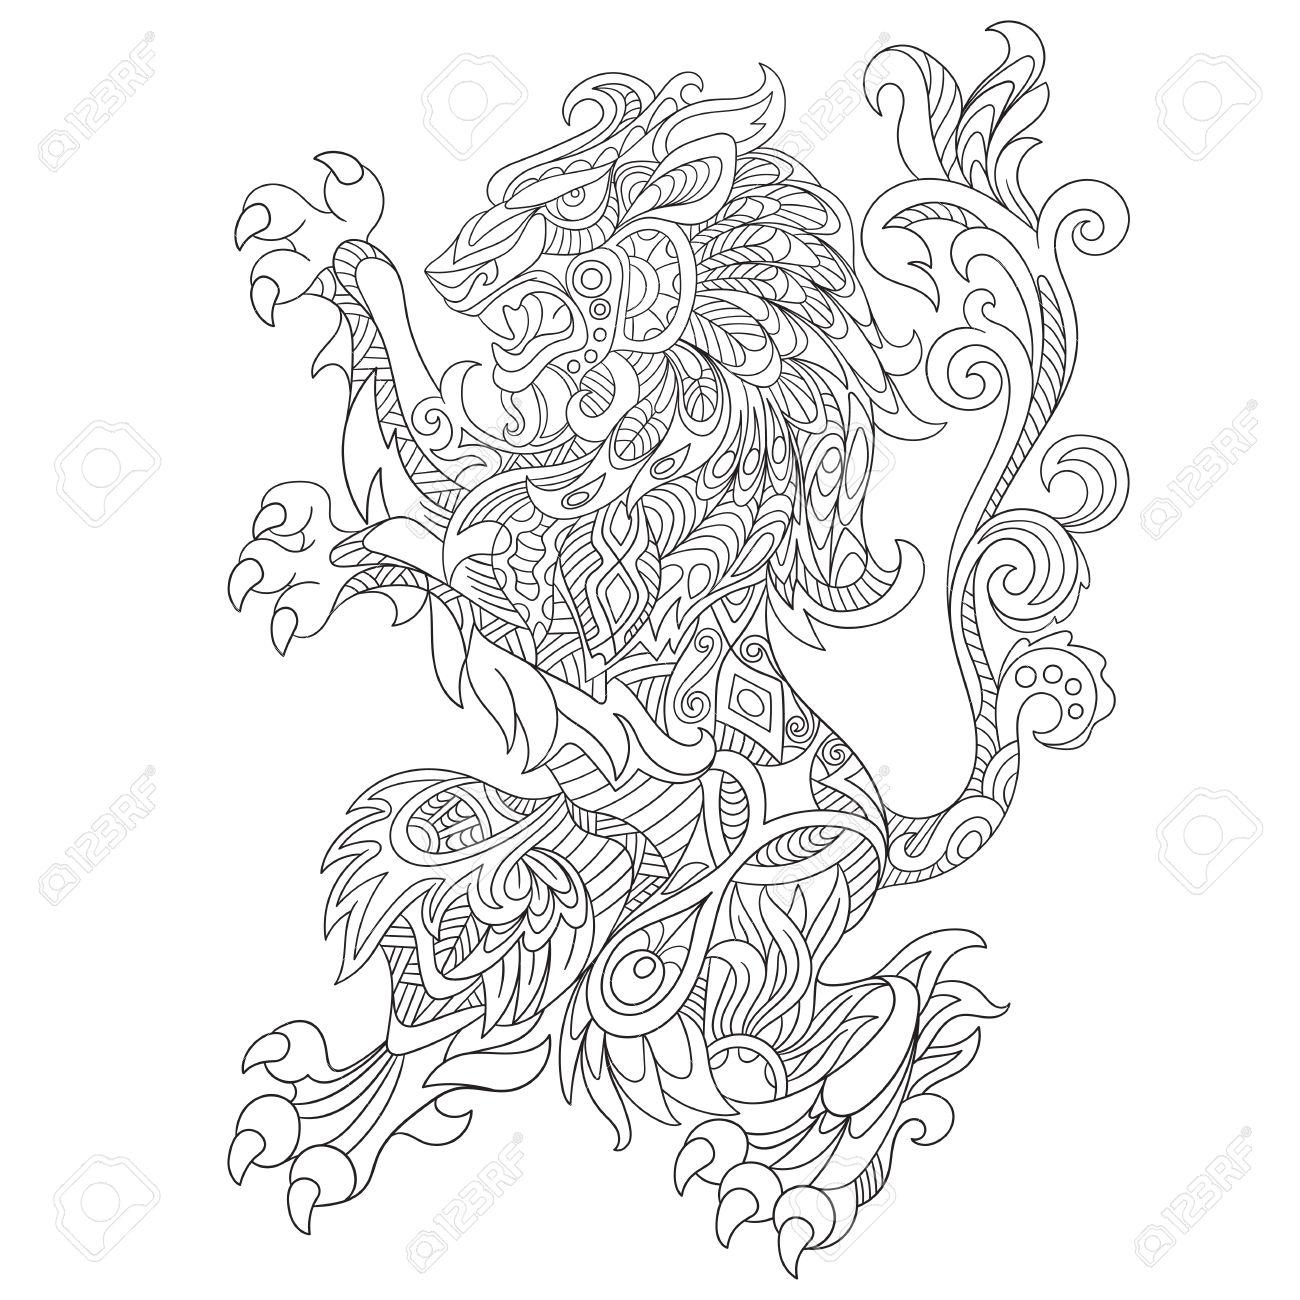 1300x1300 Stylized Cartoon Wild Angry Lion, Isolated On White Background